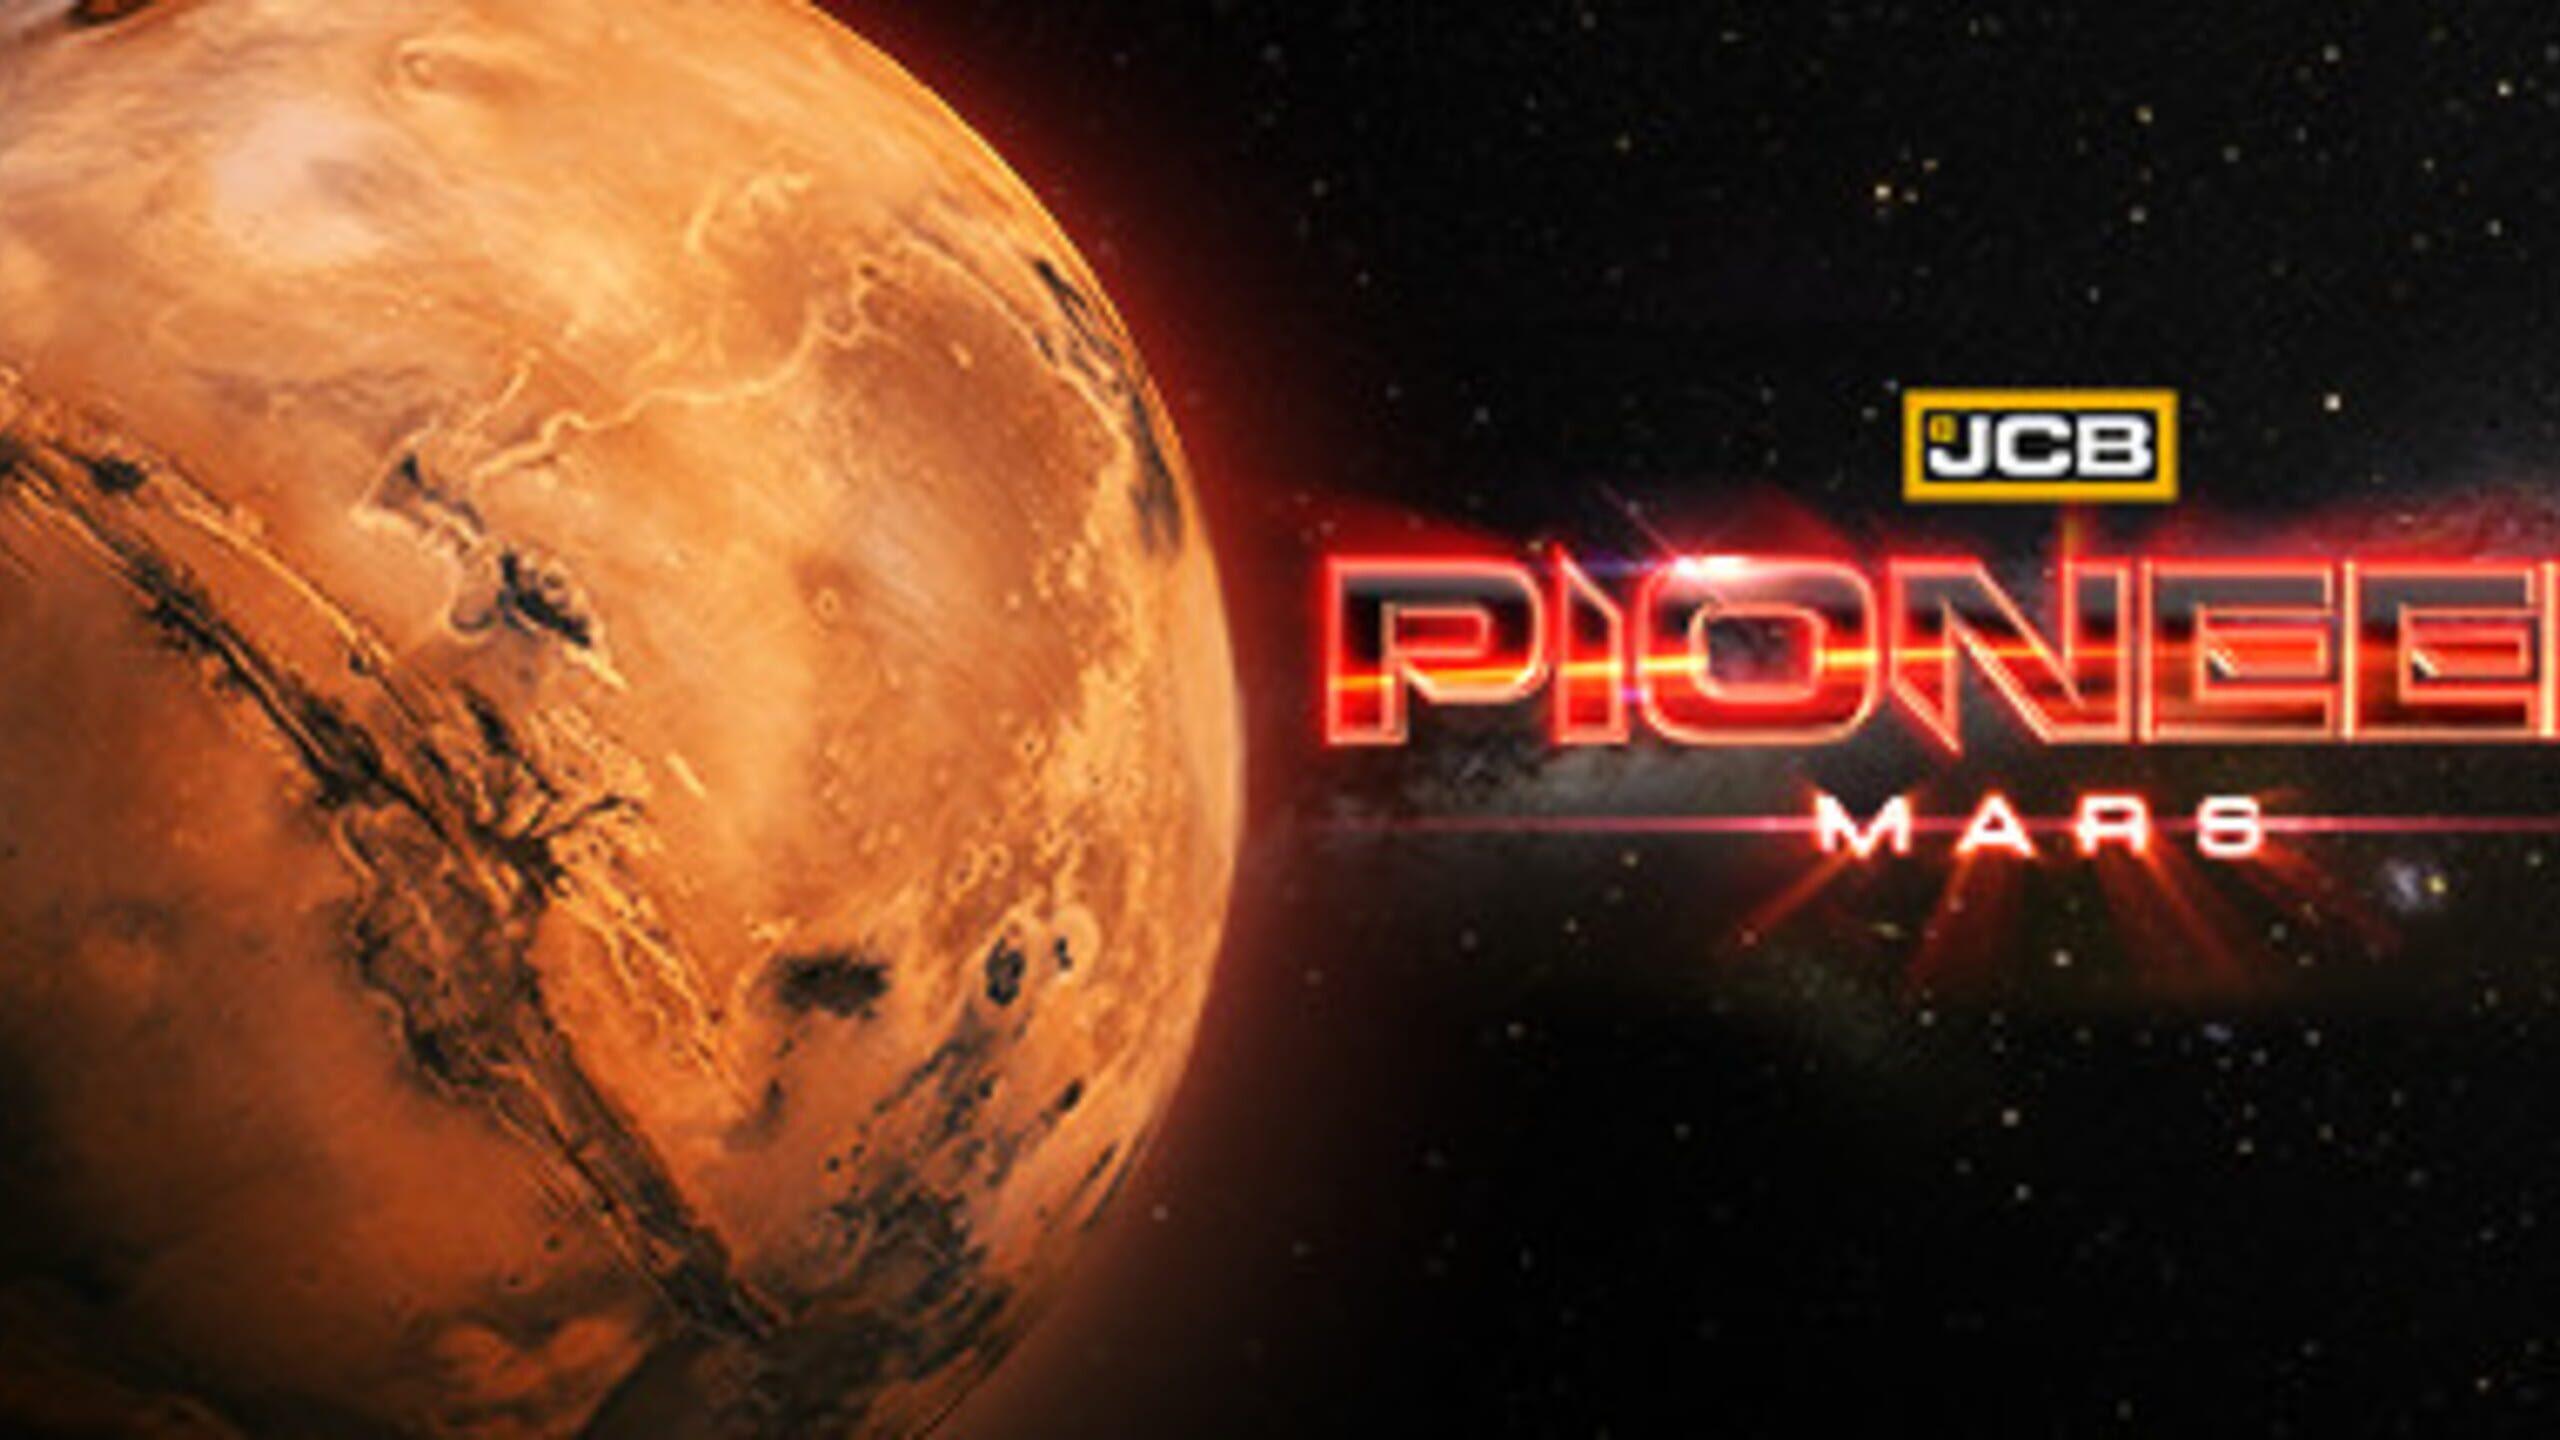 game cover art for JCB Pioneer: Mars